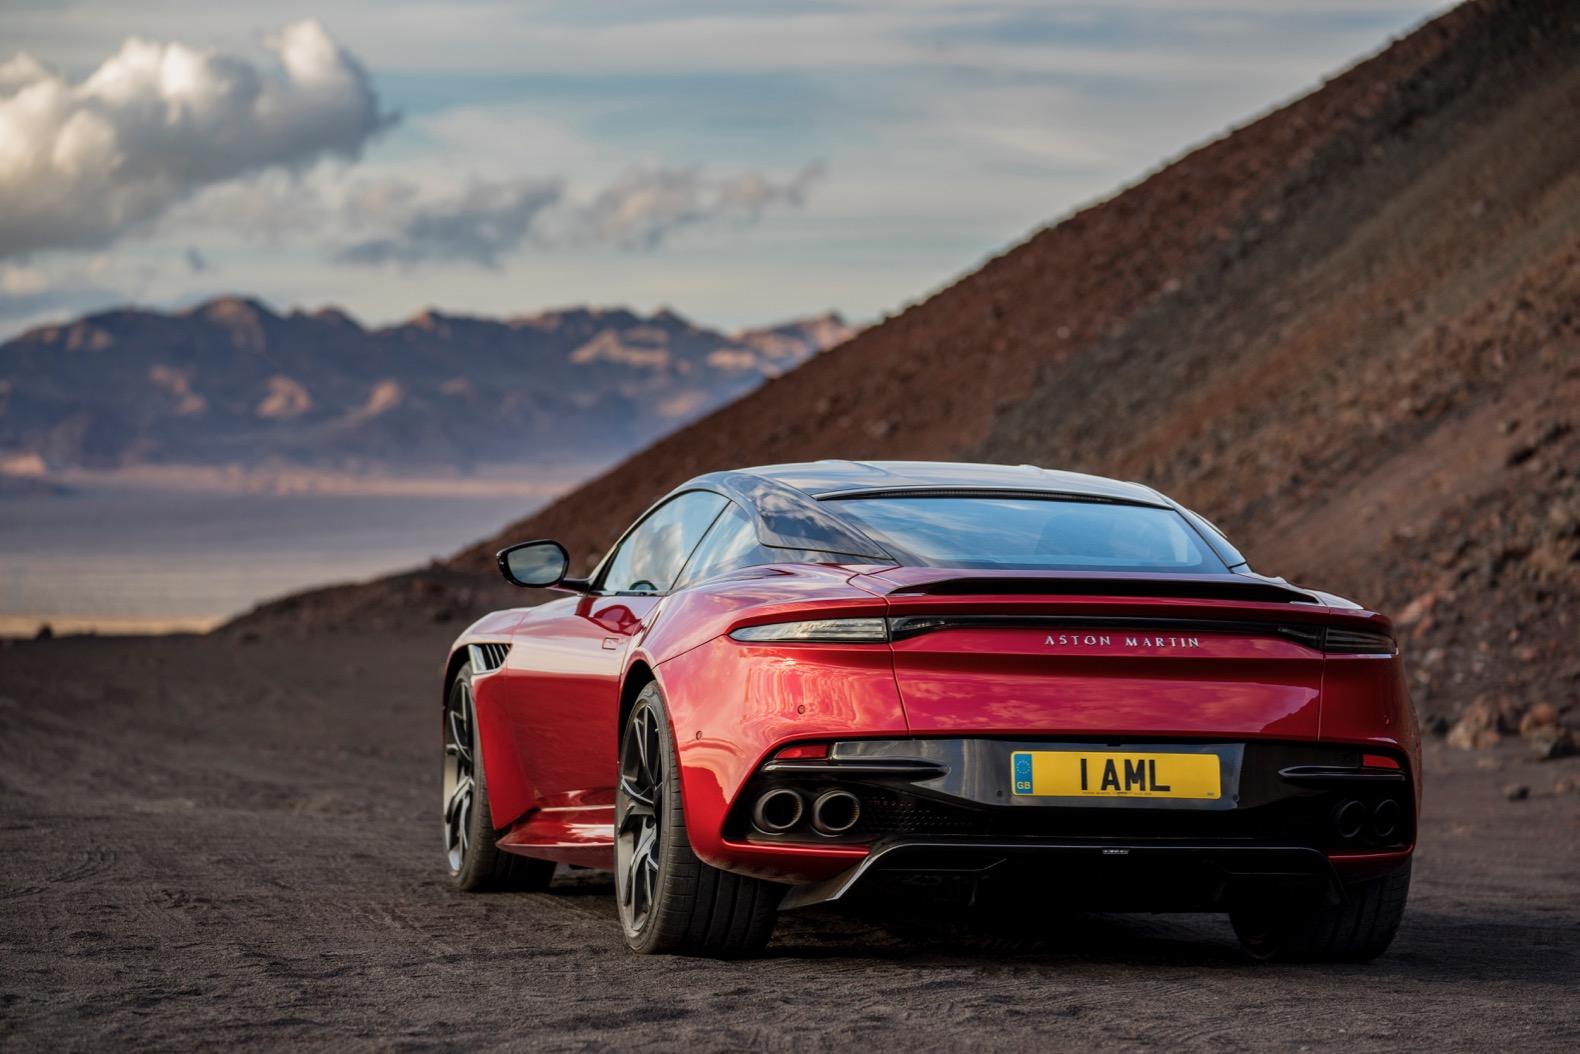 2019-Aston-Martin-DBS-Superleggera-00019.jpg